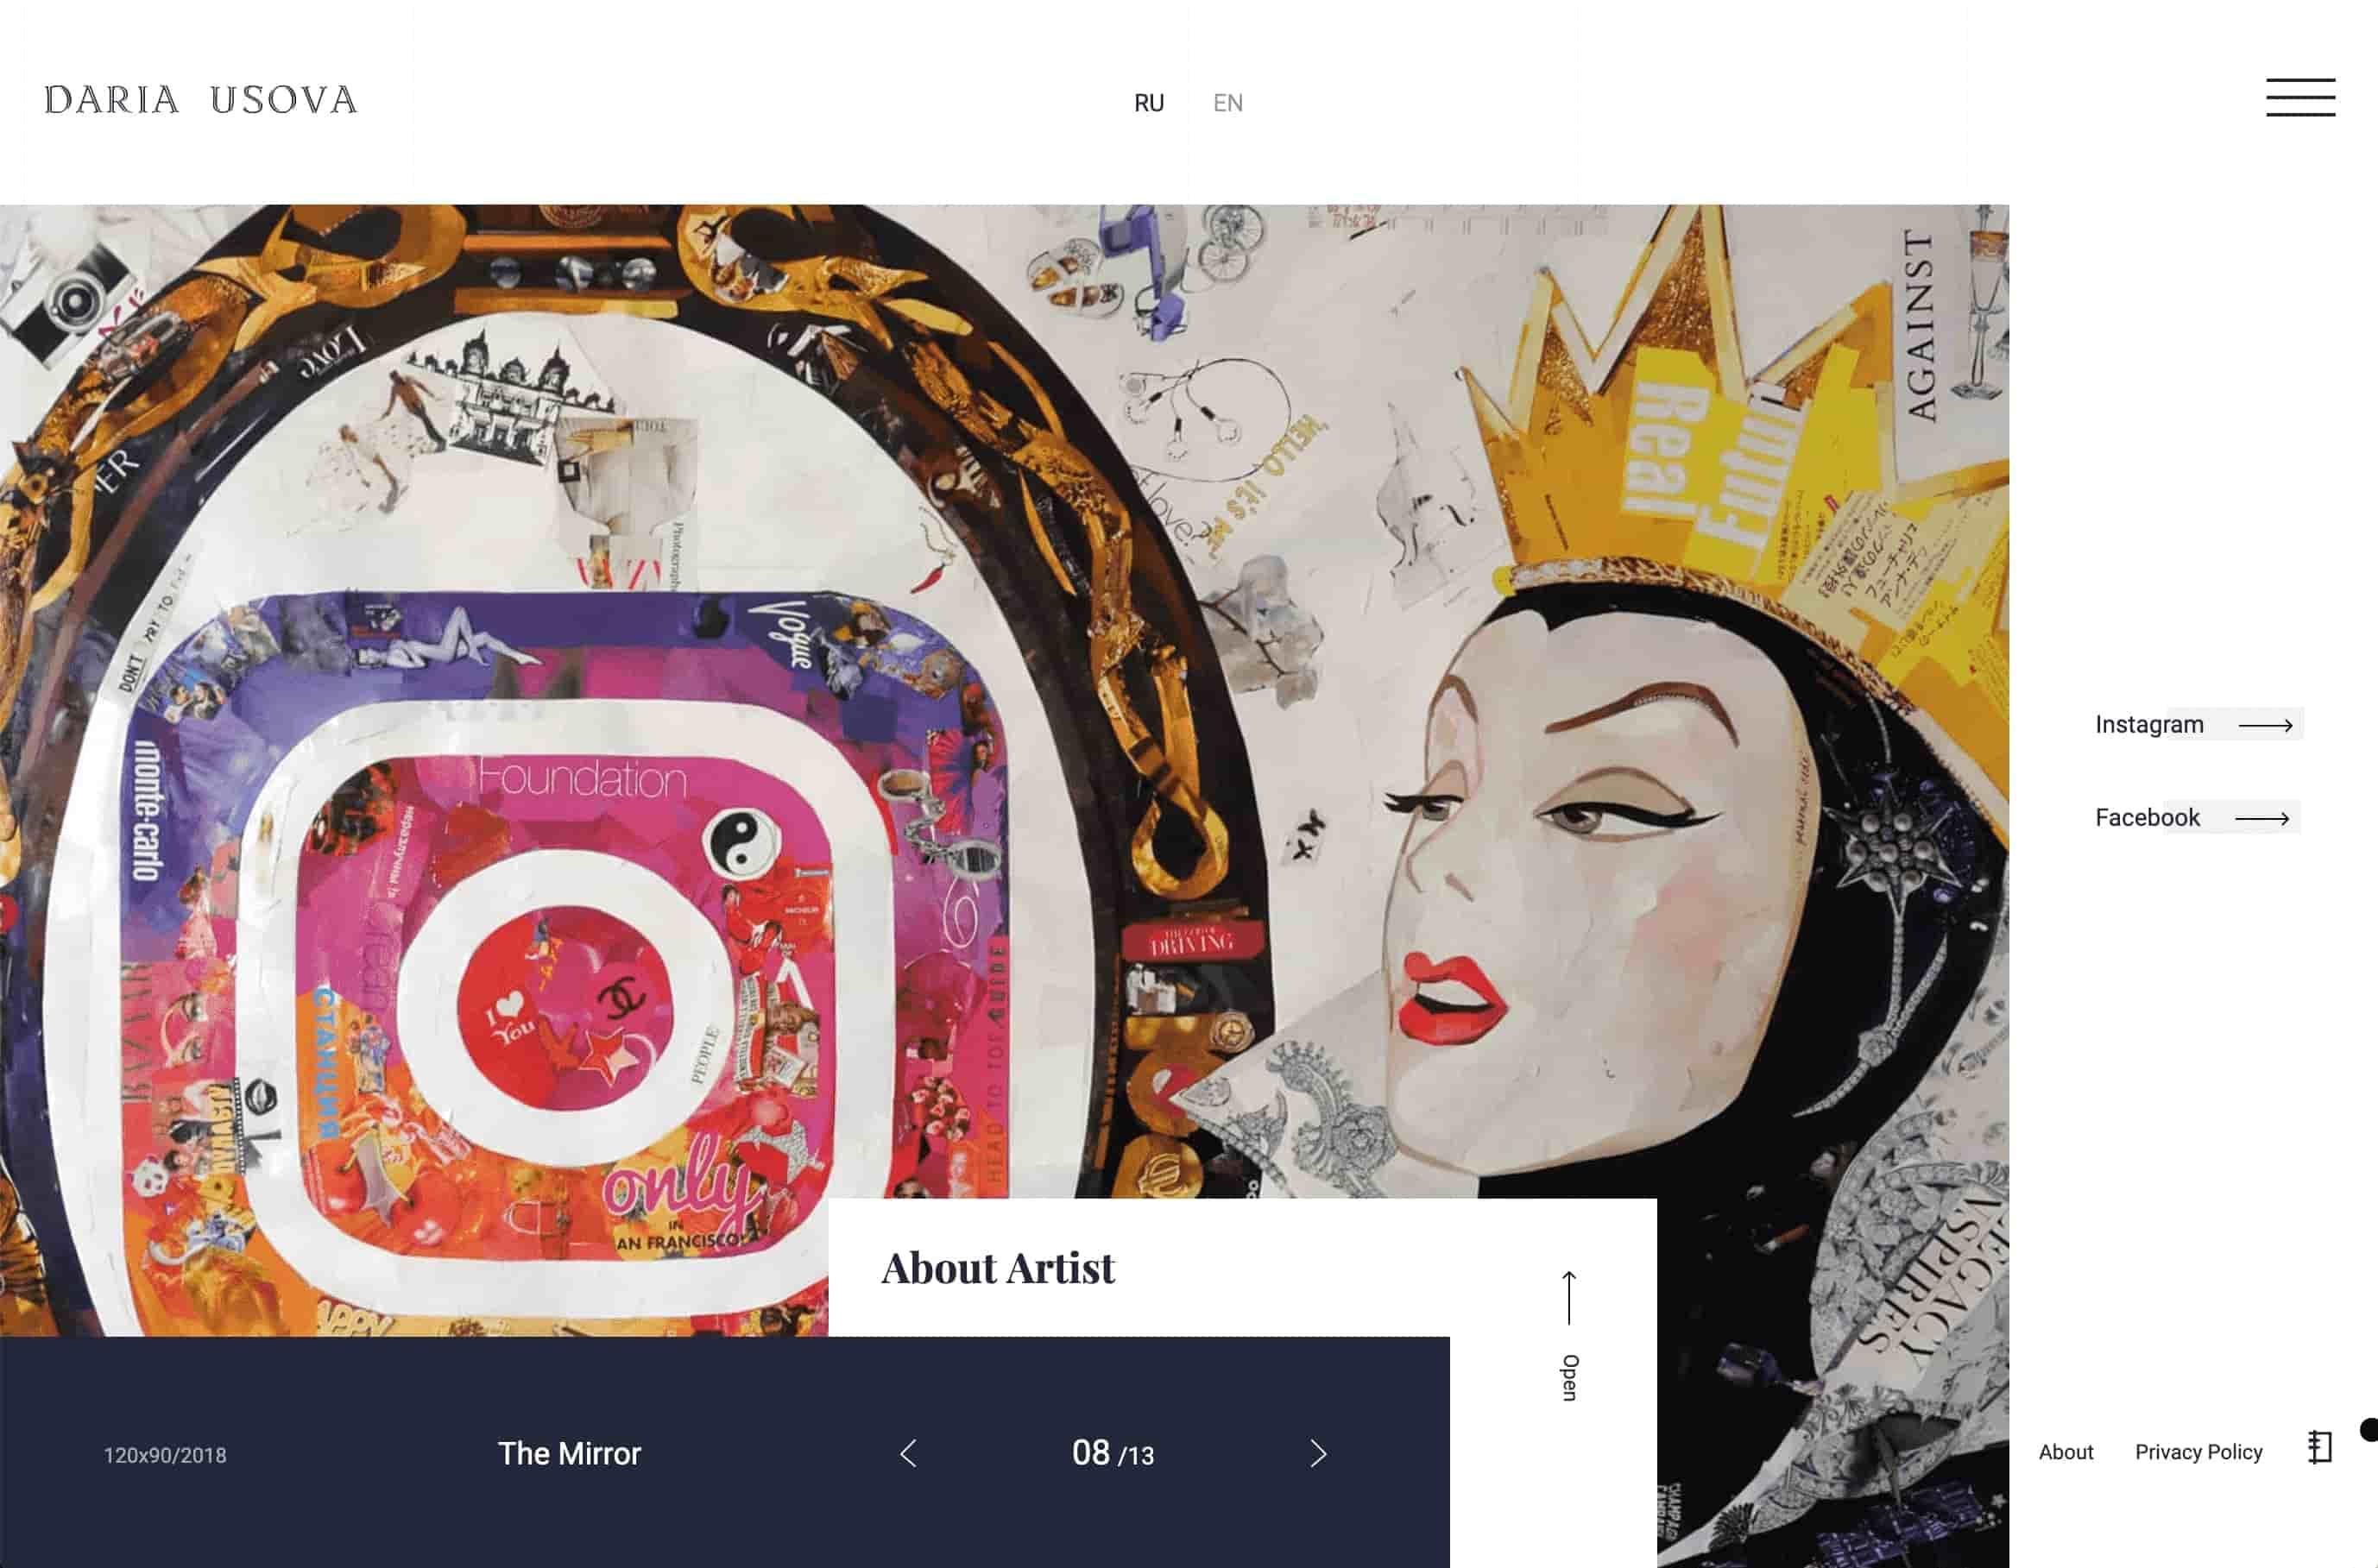 Hot web design trends: Overlapping elements by Daria Usova | Codica